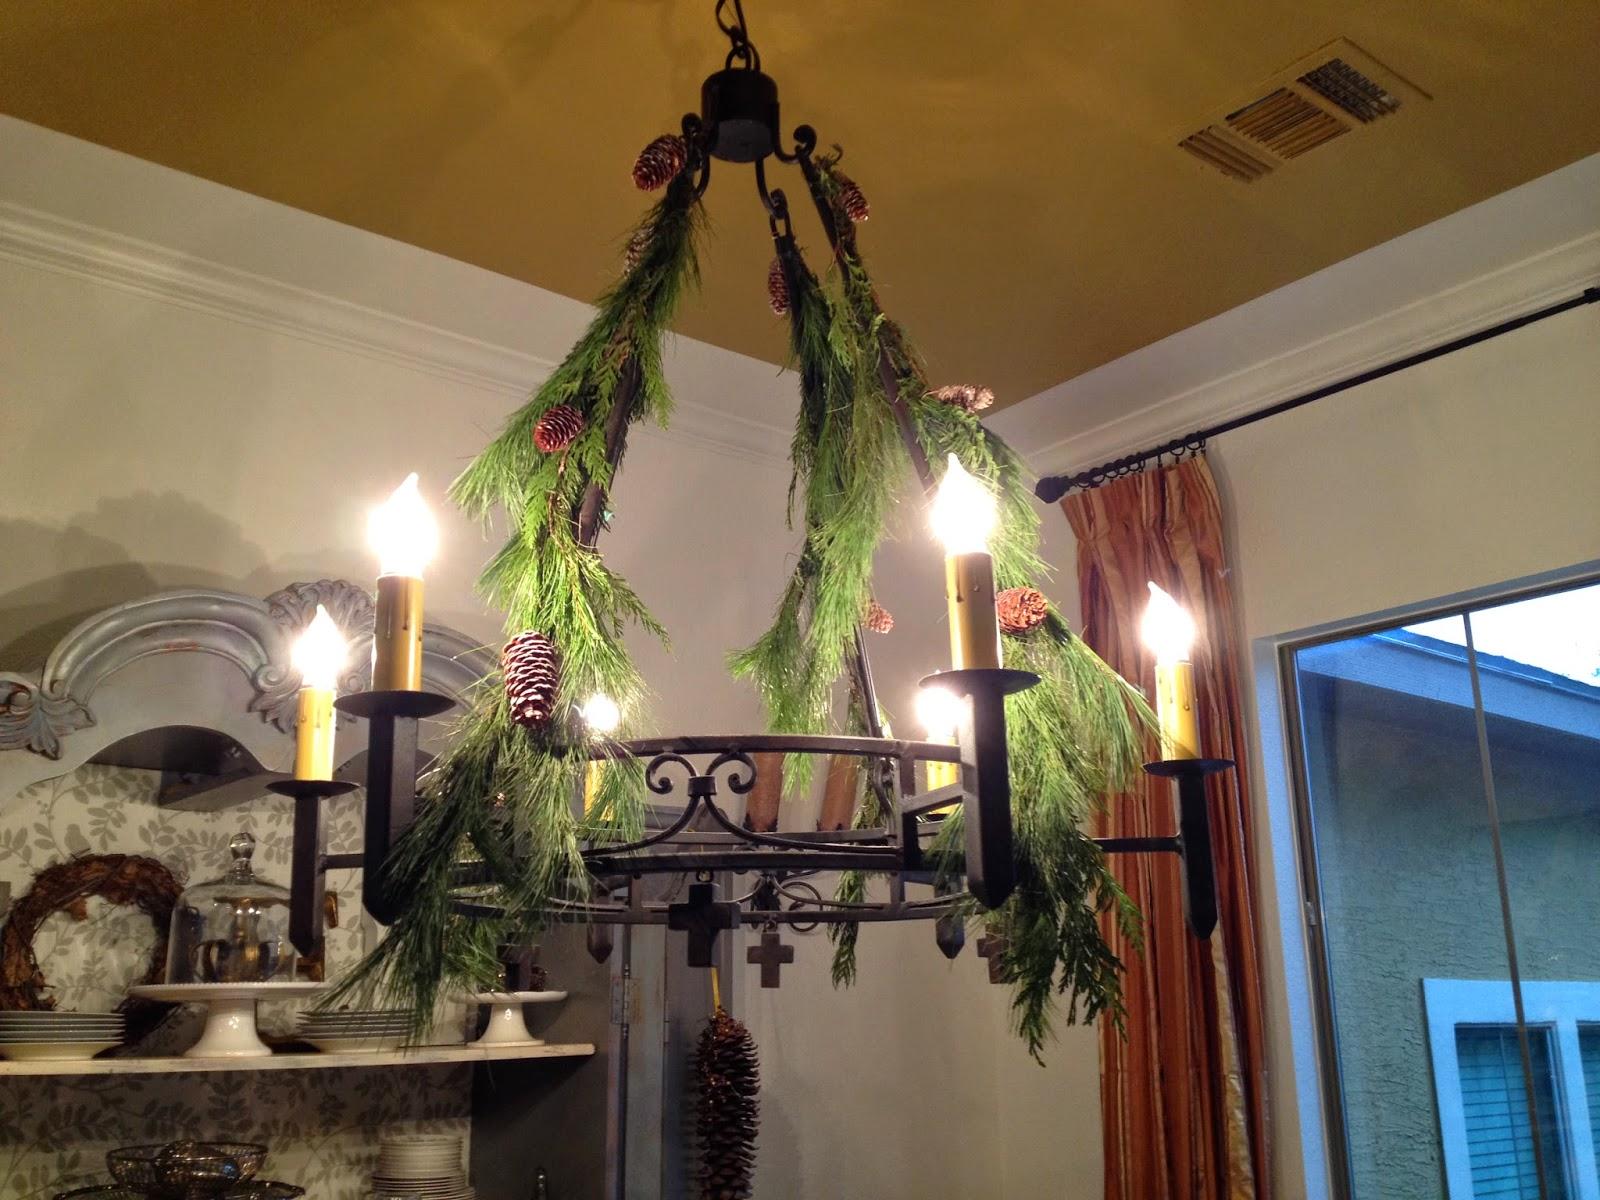 greenery around a chandelier